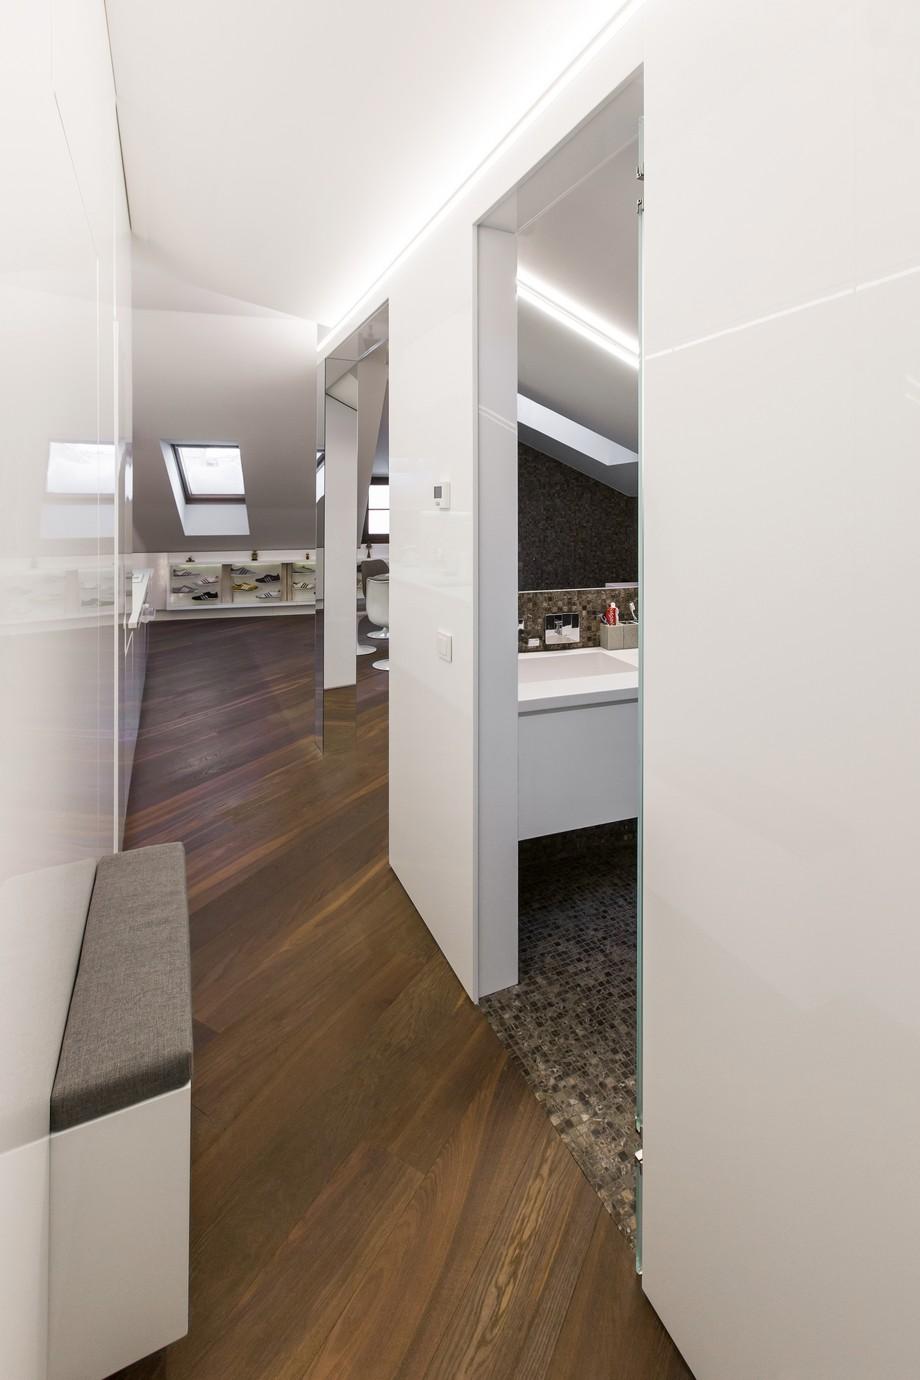 Interior_attic_studio_YCL_9